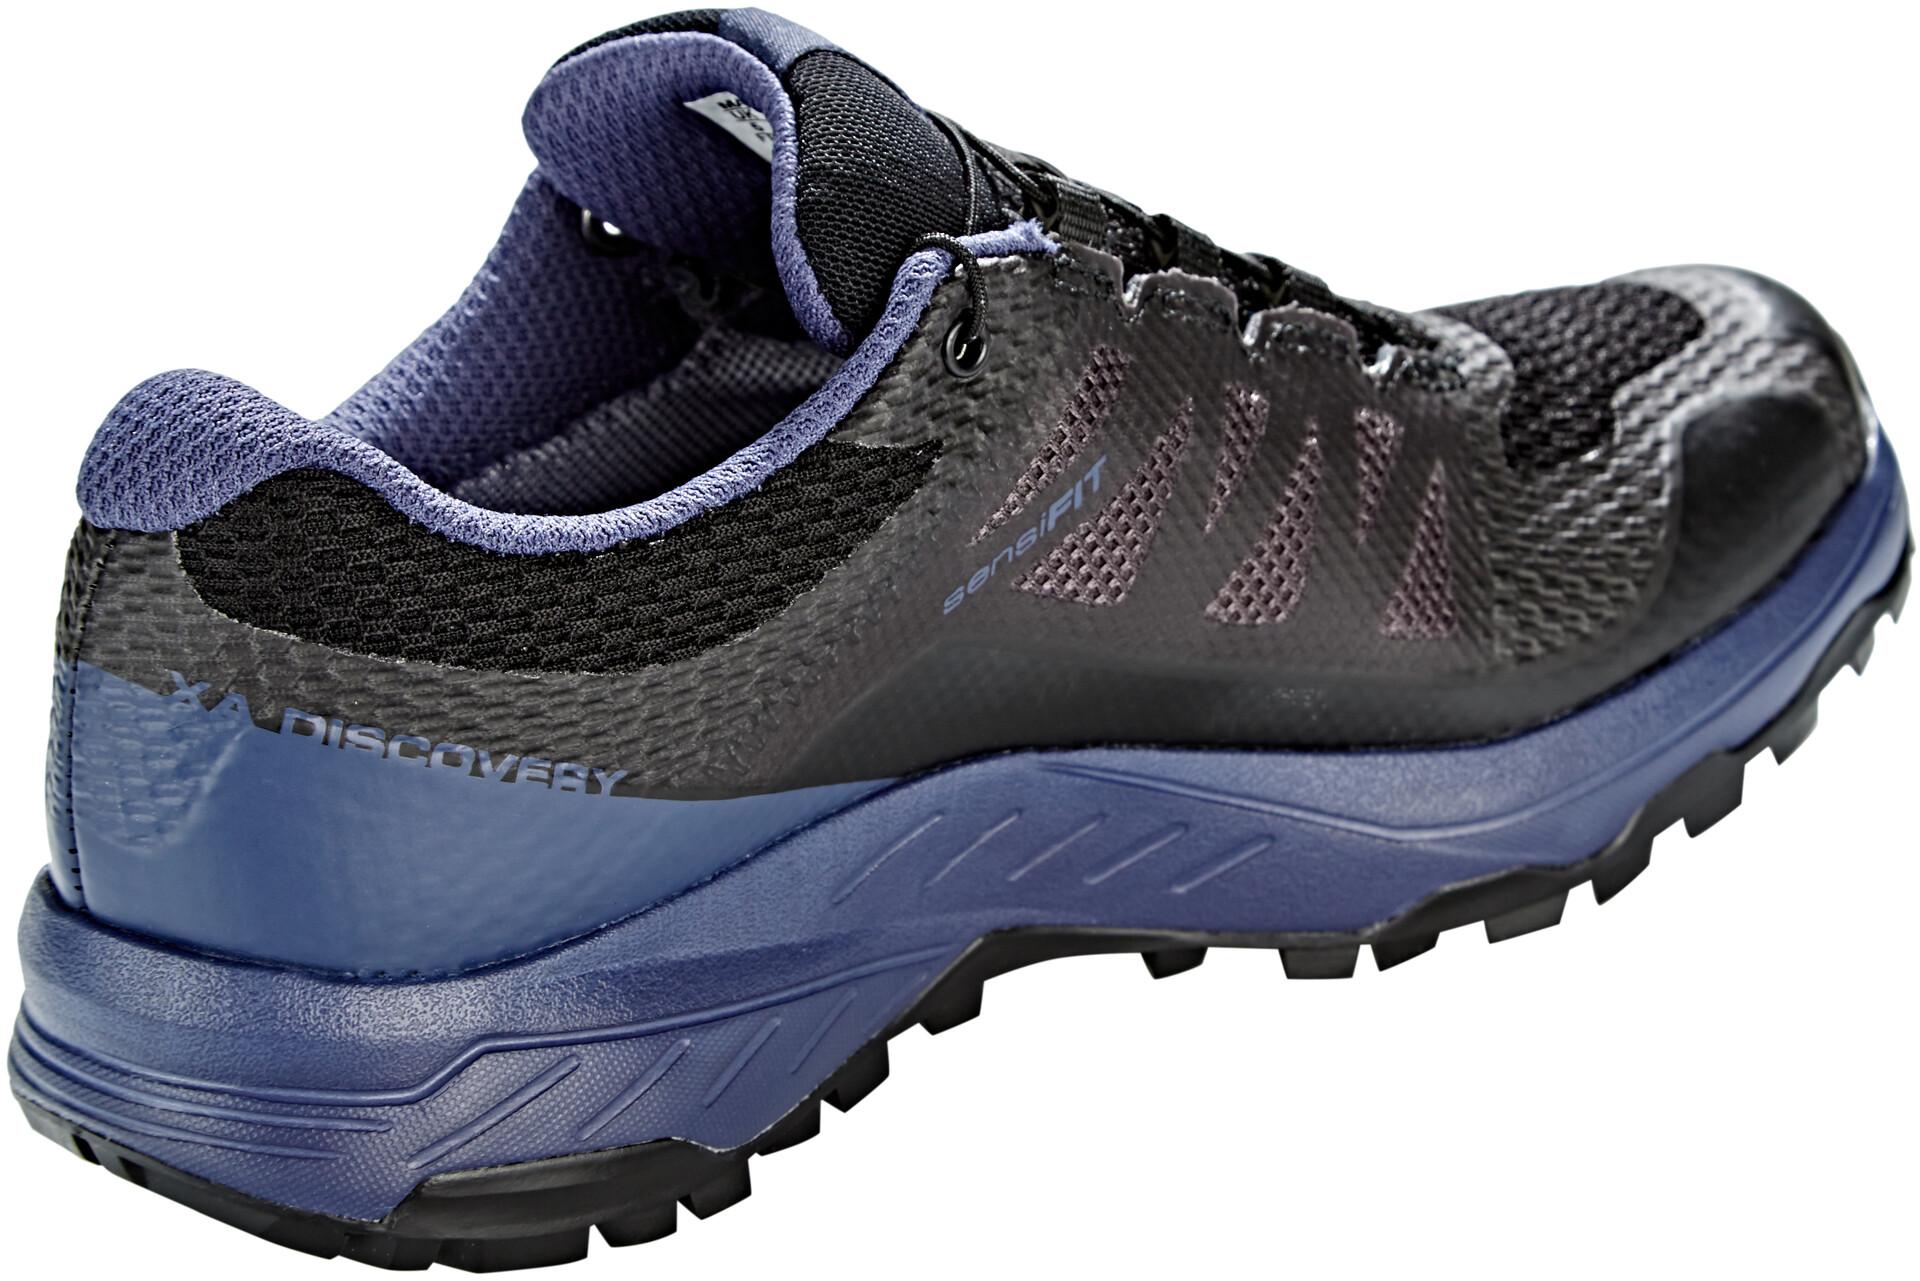 Blueebony FemmeBlackcrown Salomon Xa Gtx Chaussures Discovery thrsQd